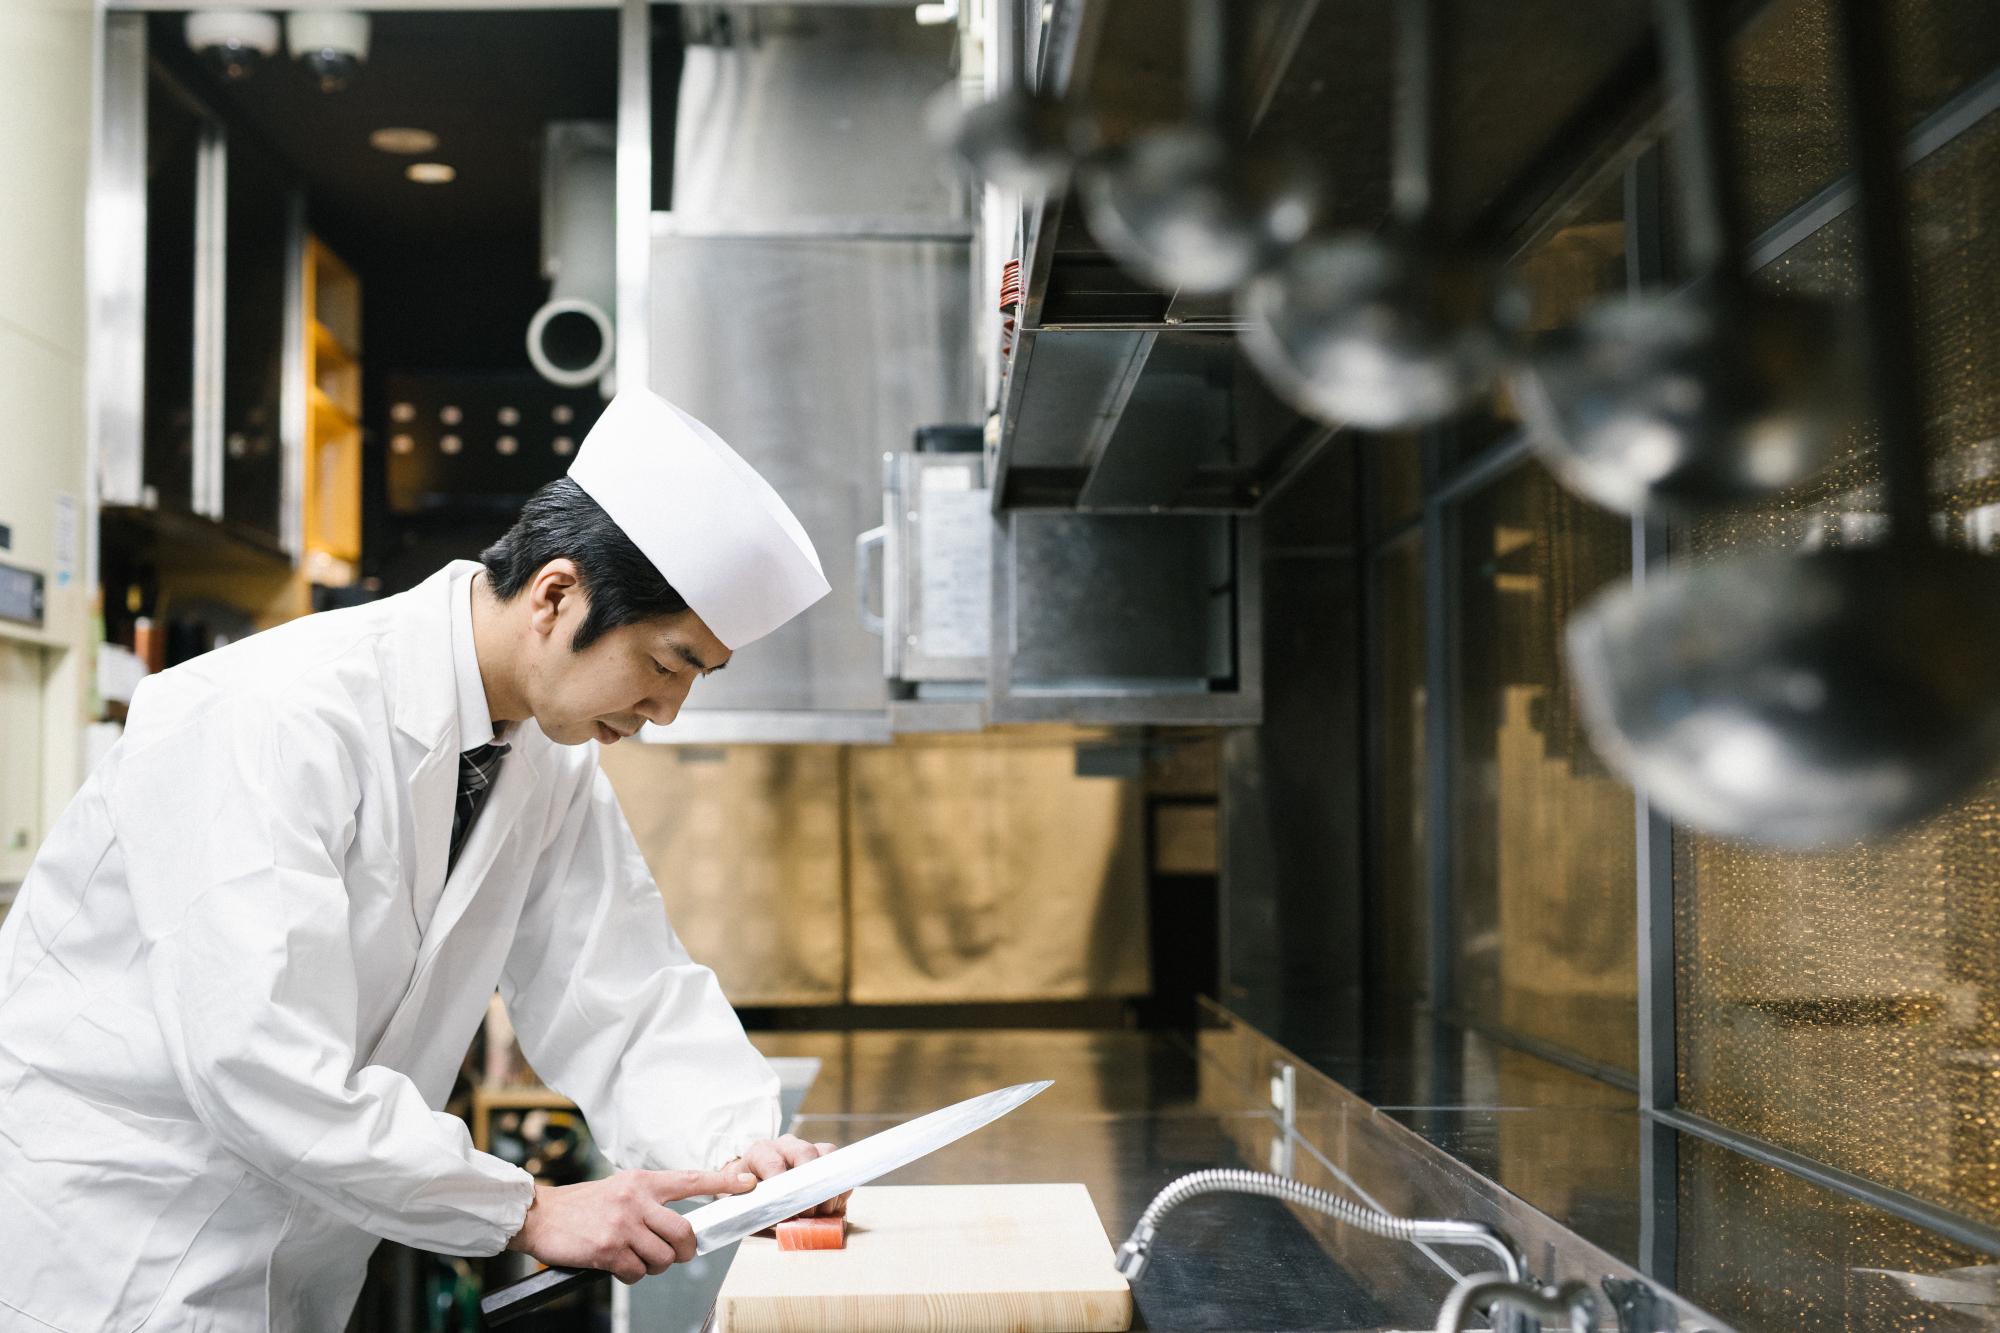 mihaku,瓢喜,瓢斗,香水亭,日本料理,出汁しゃぶ